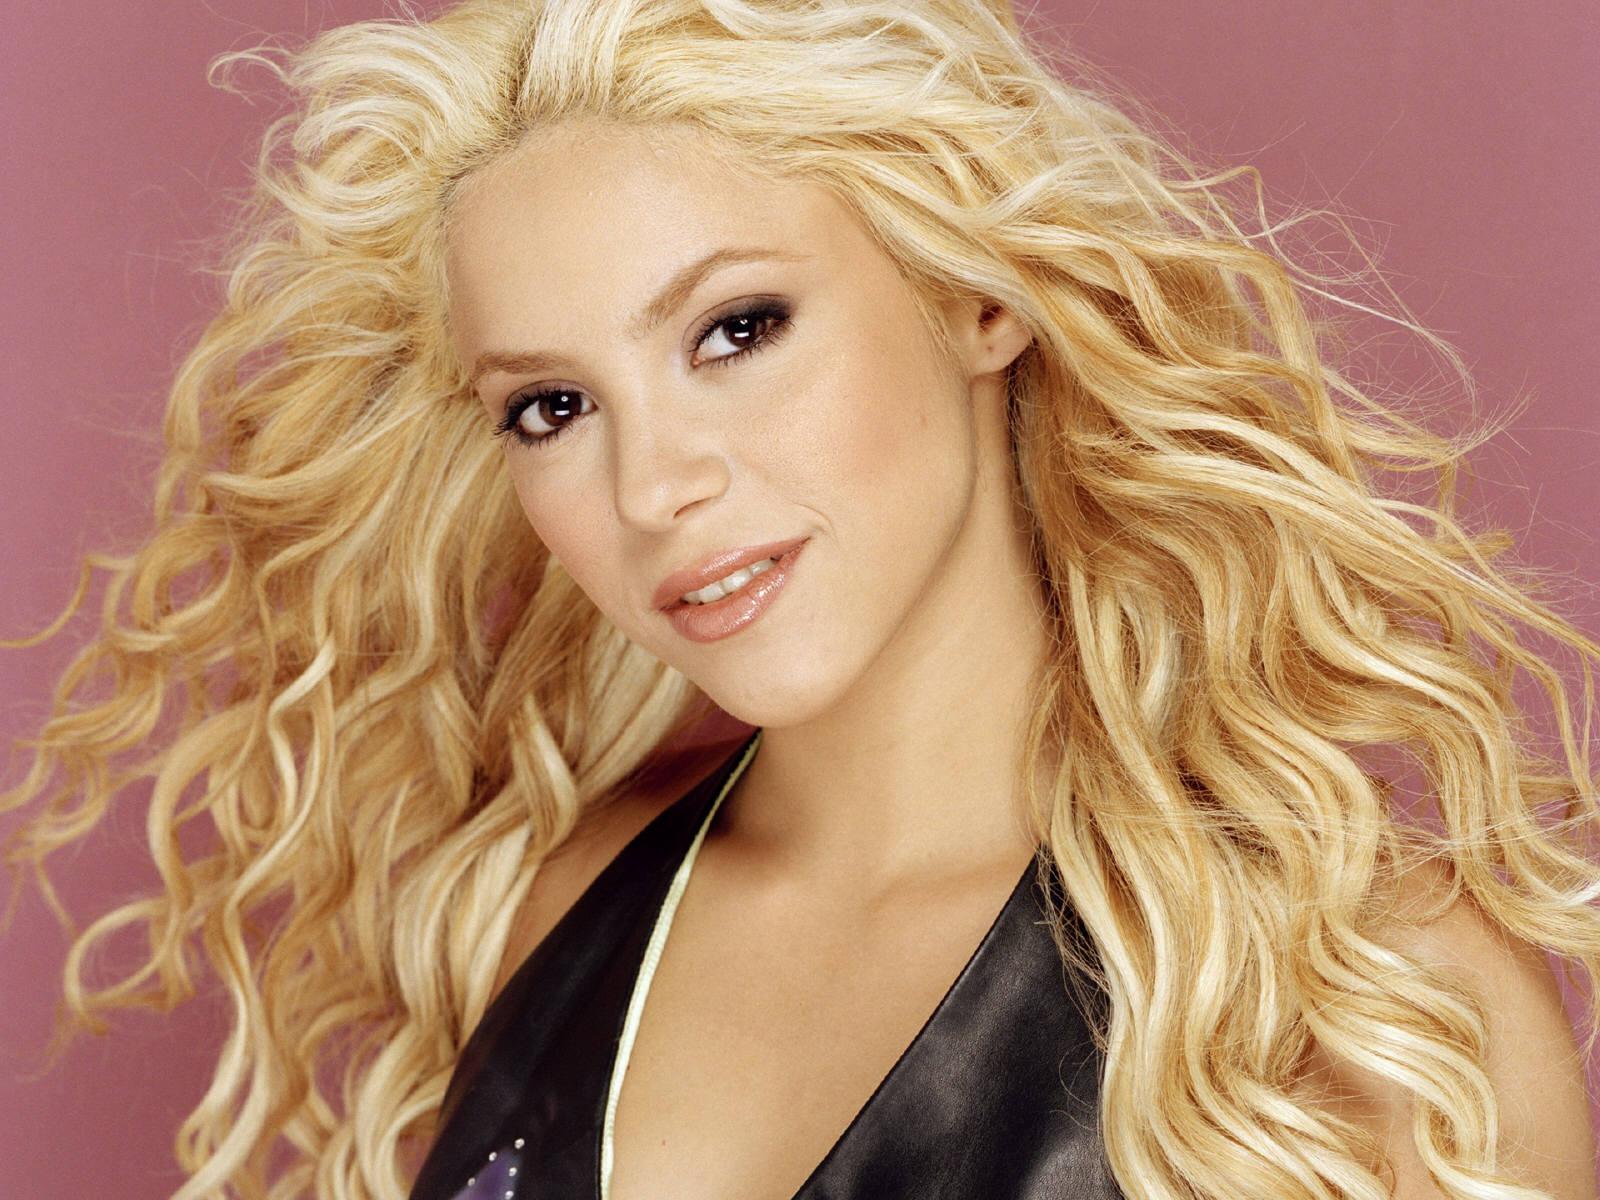 Shakira wallpaper, shakira wallpaper hd | Simple Wallpapers Shakira